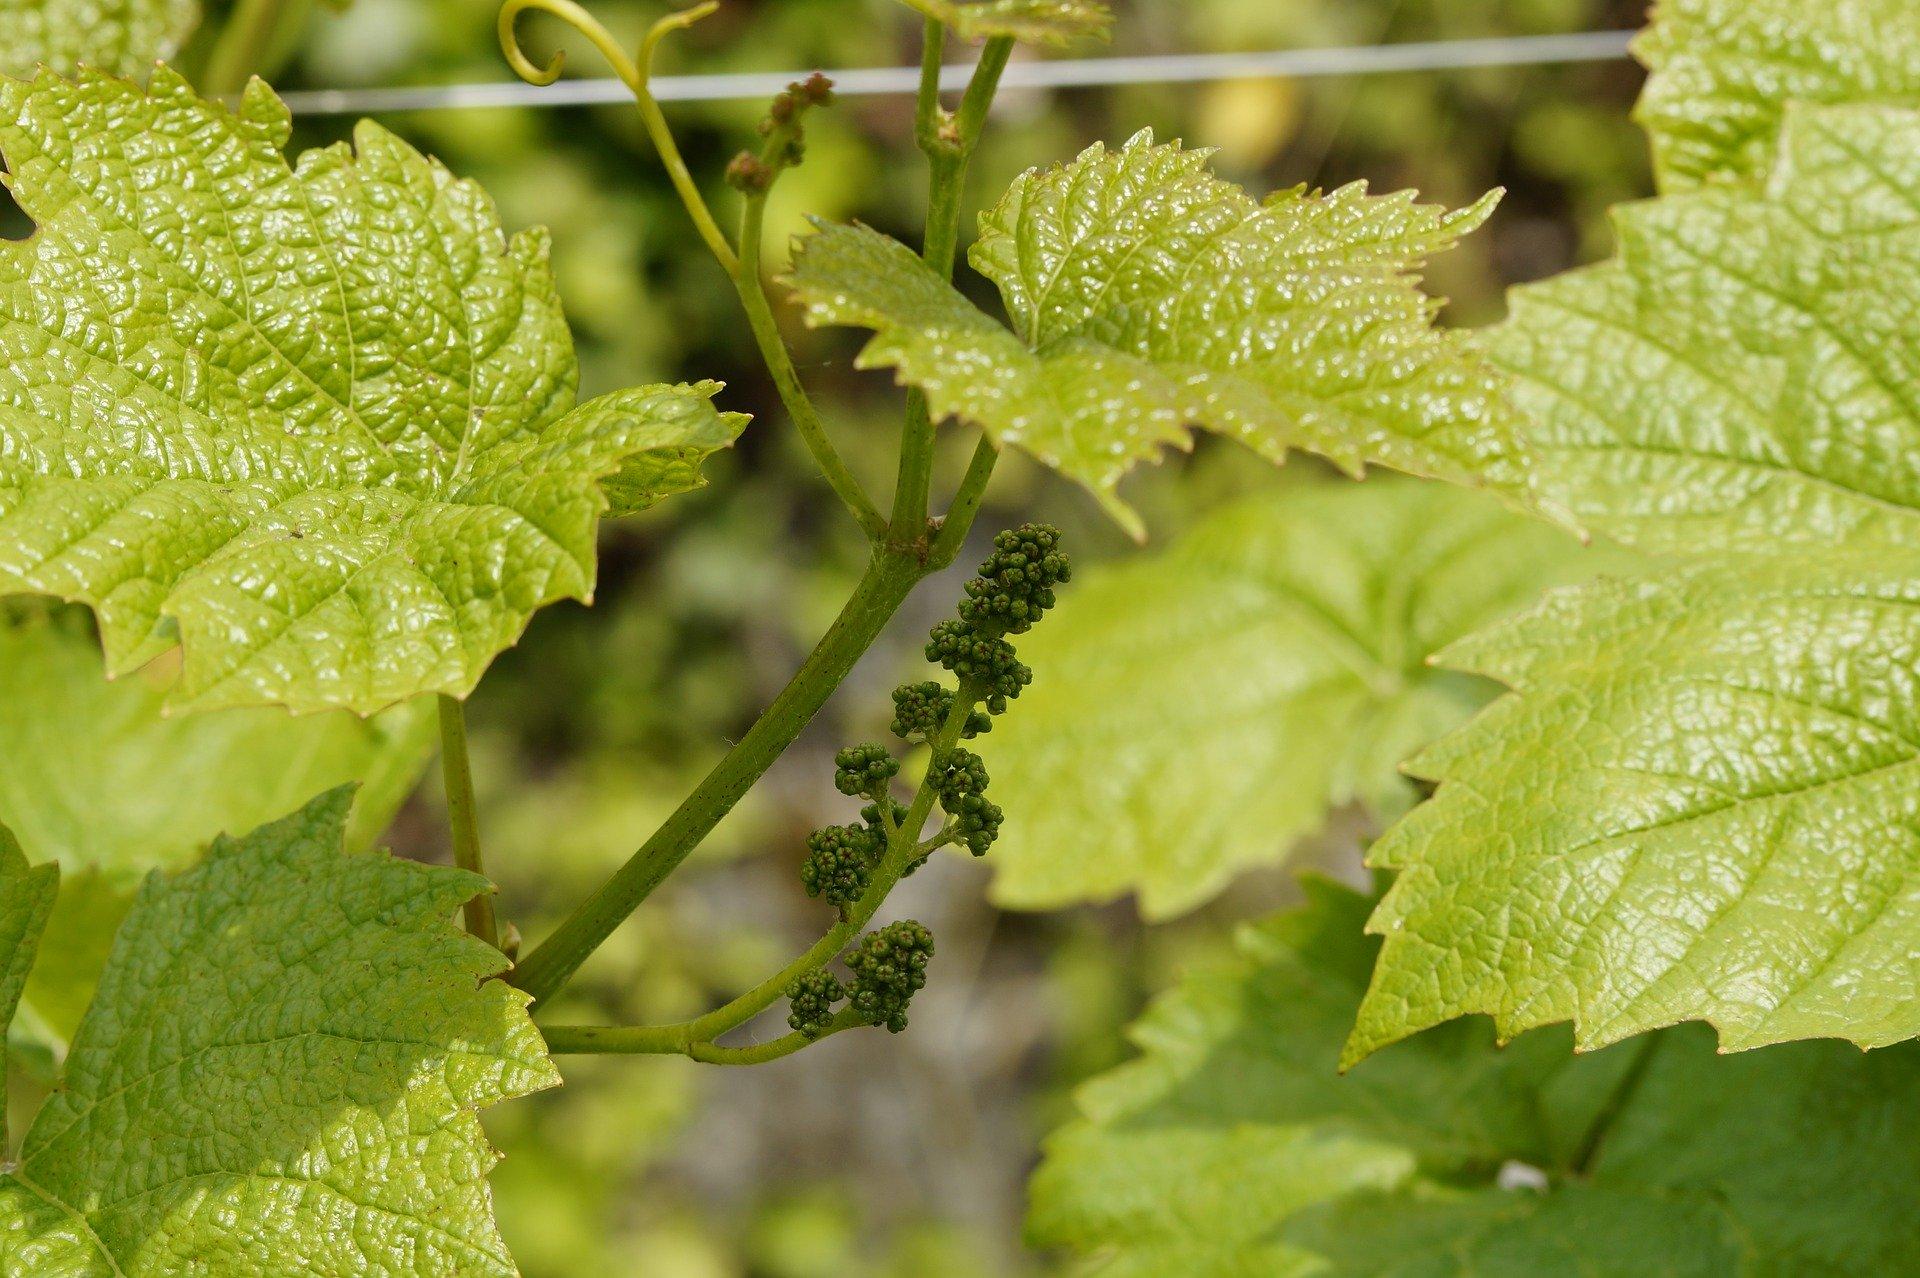 Udus - Grappolo d'uva